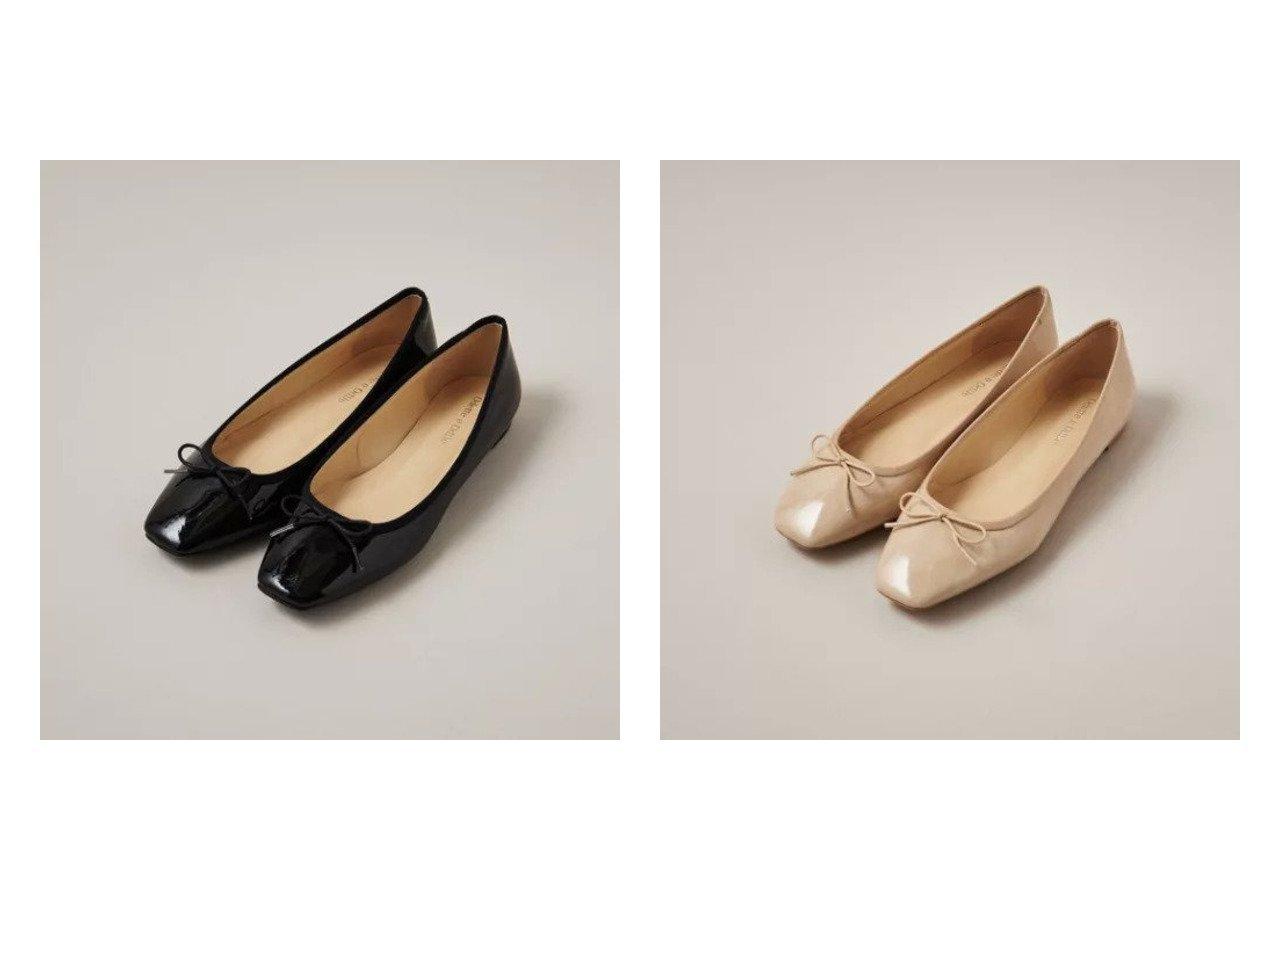 【Odette e Odile/オデット エ オディール】の【晴雨兼用】OFD R スクエアバレエ FLT10◎↓↑ 【シューズ・靴】おすすめ!人気、トレンド・レディースファッションの通販 おすすめで人気の流行・トレンド、ファッションの通販商品 インテリア・家具・メンズファッション・キッズファッション・レディースファッション・服の通販 founy(ファニー) https://founy.com/ ファッション Fashion レディースファッション WOMEN 抗菌 シューズ スクエア バレエ |ID:crp329100000055099